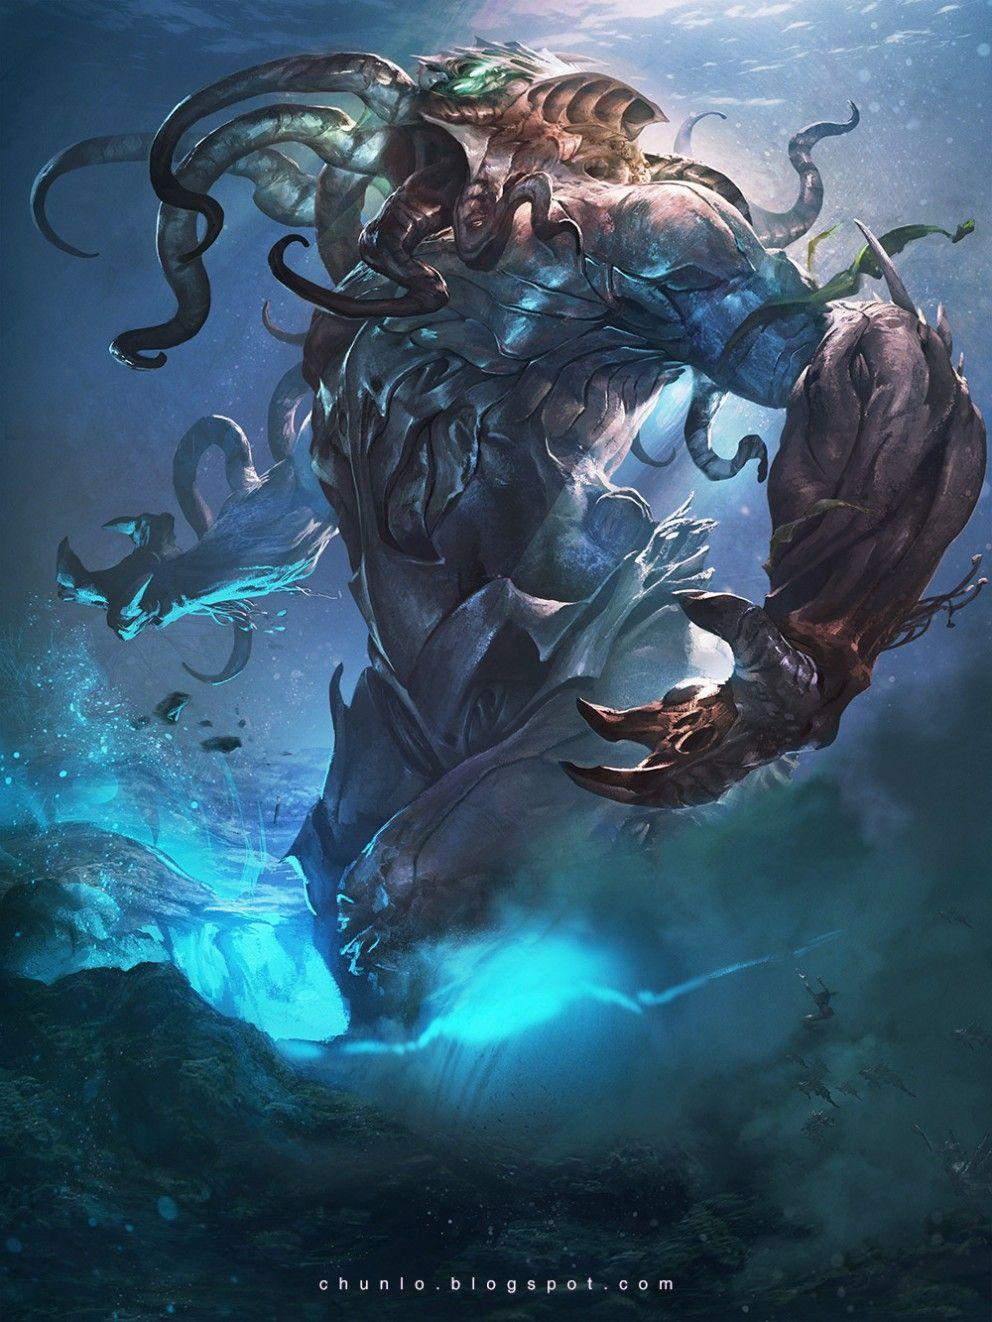 Coolvibe Digital Art Wallpapers Inspirationcoolvibe Digital Art Digital Art Gallery Featured Art Monster Concept Art Fantasy Creatures Fantasy Monster